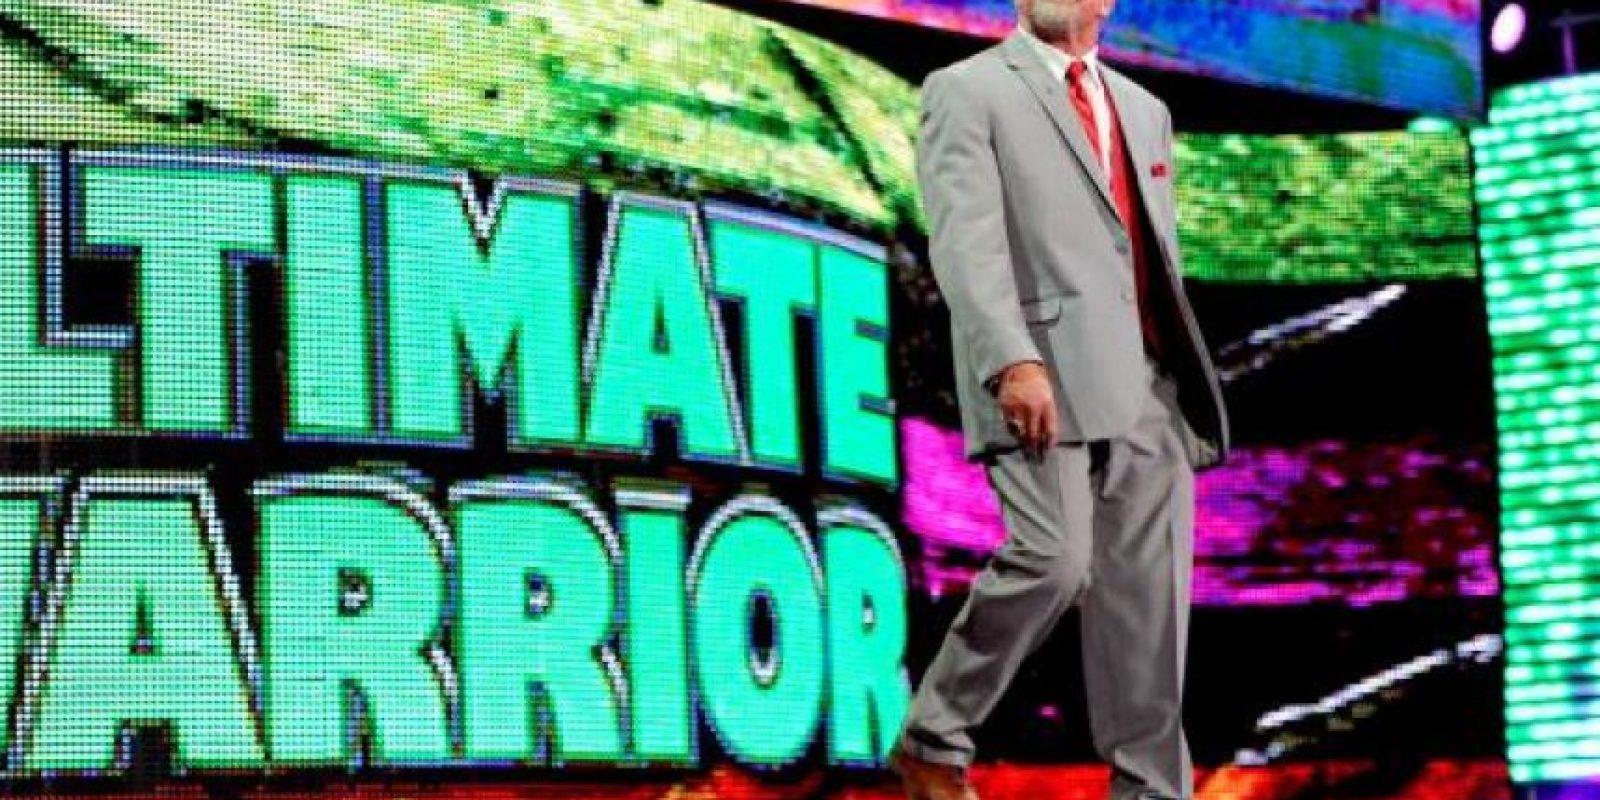 5. Ultimate Warrior Foto:WWE